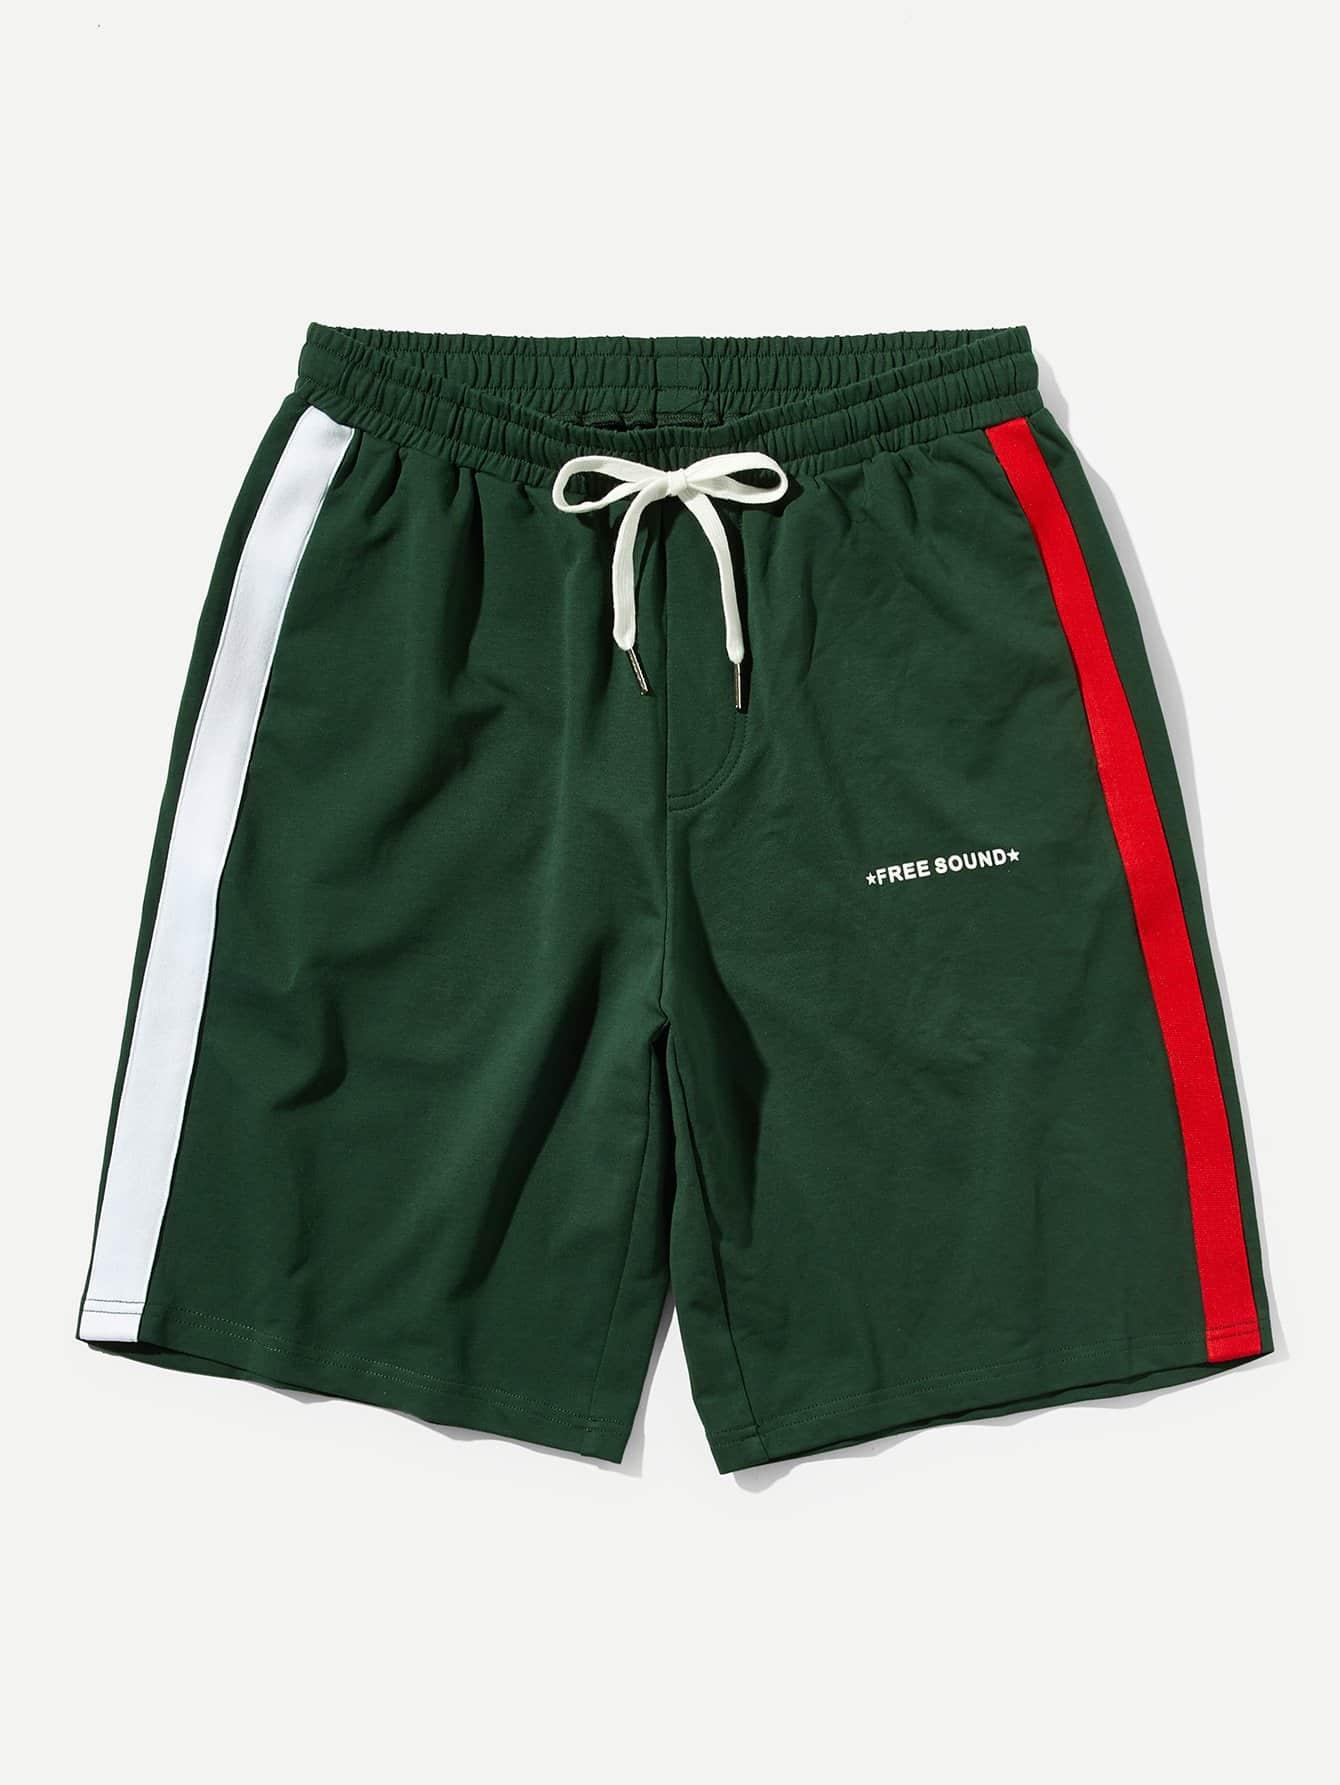 Men Striped Side Drawstring Waist Shorts men colorful striped drawstring shorts